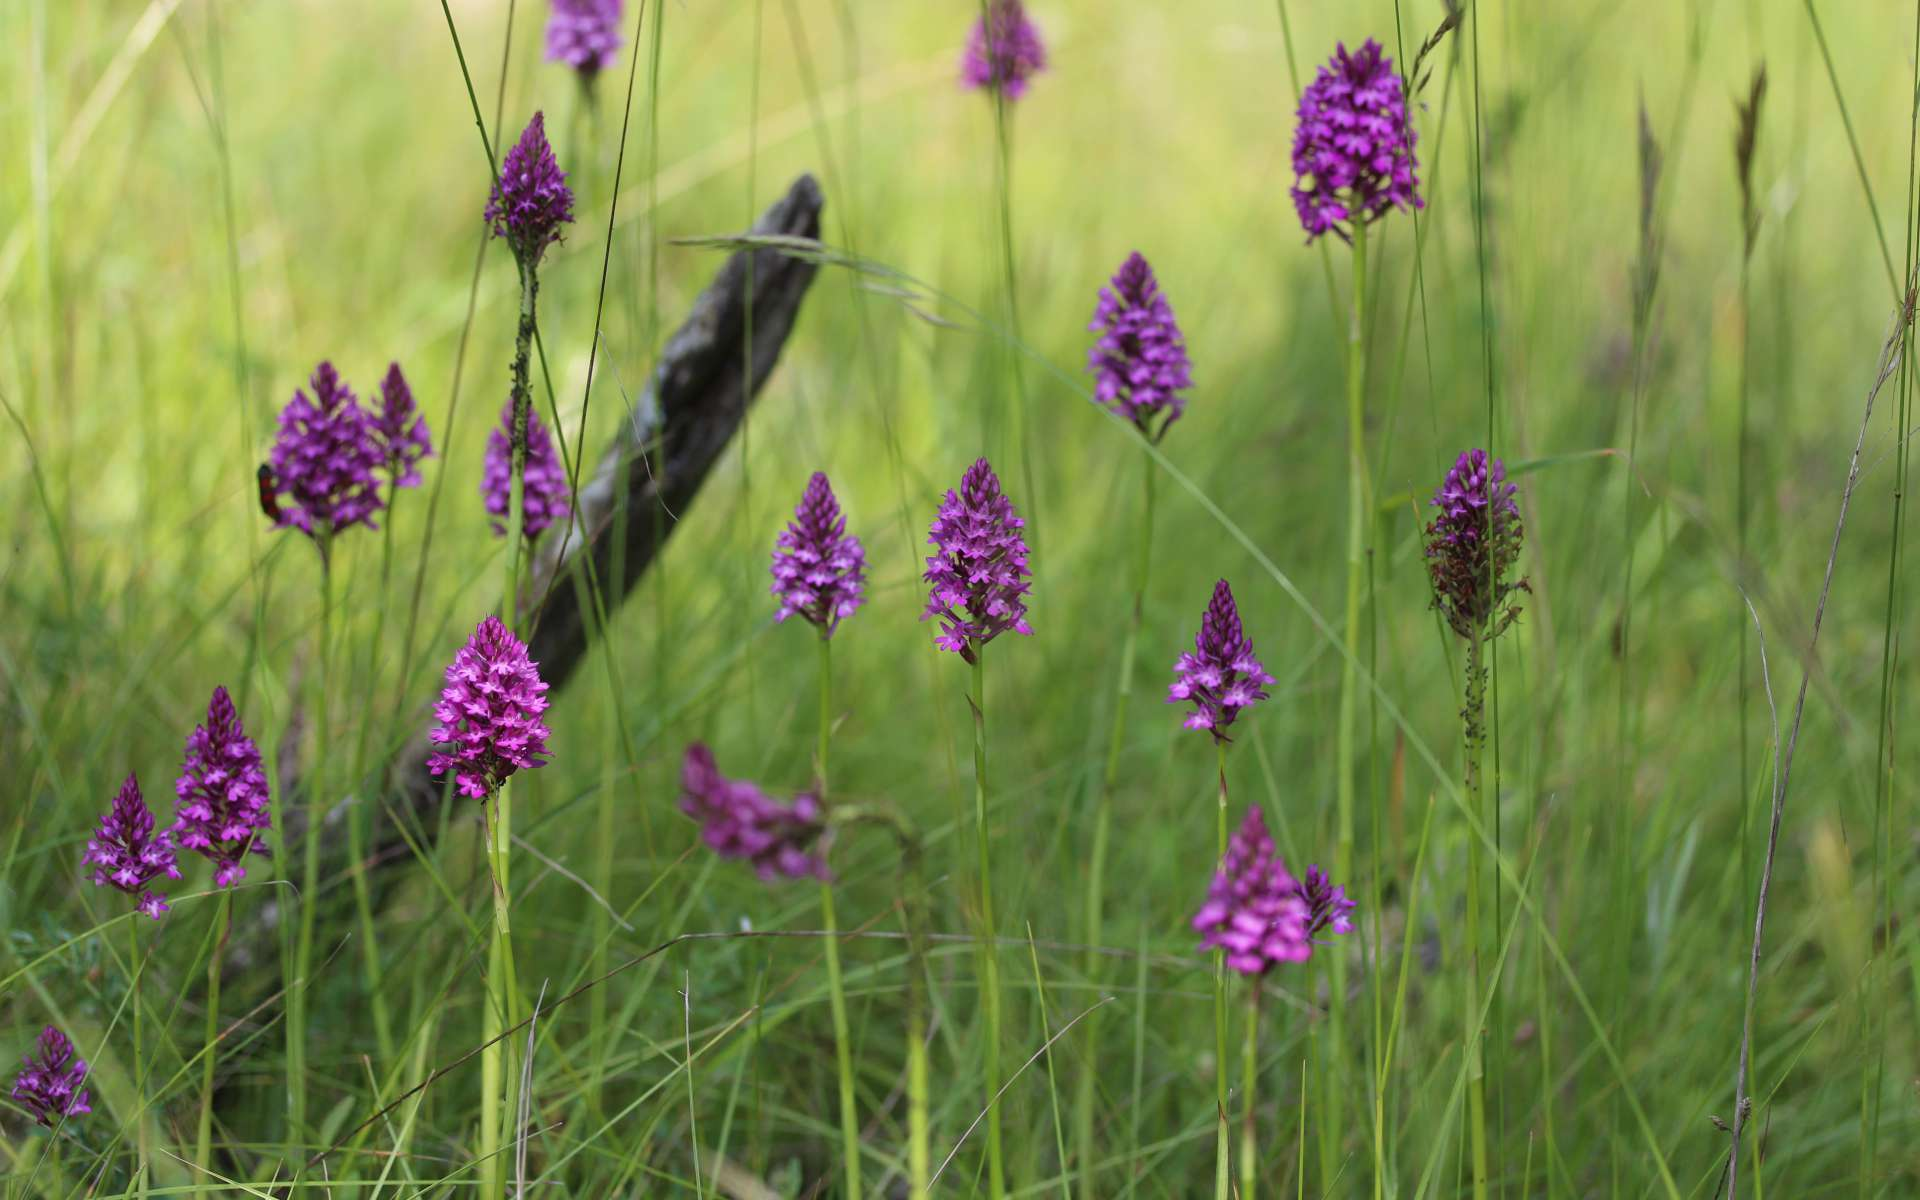 Orchis pyramidal - vue d'ensemble (Crédits : Flickr - Bjorn S.)